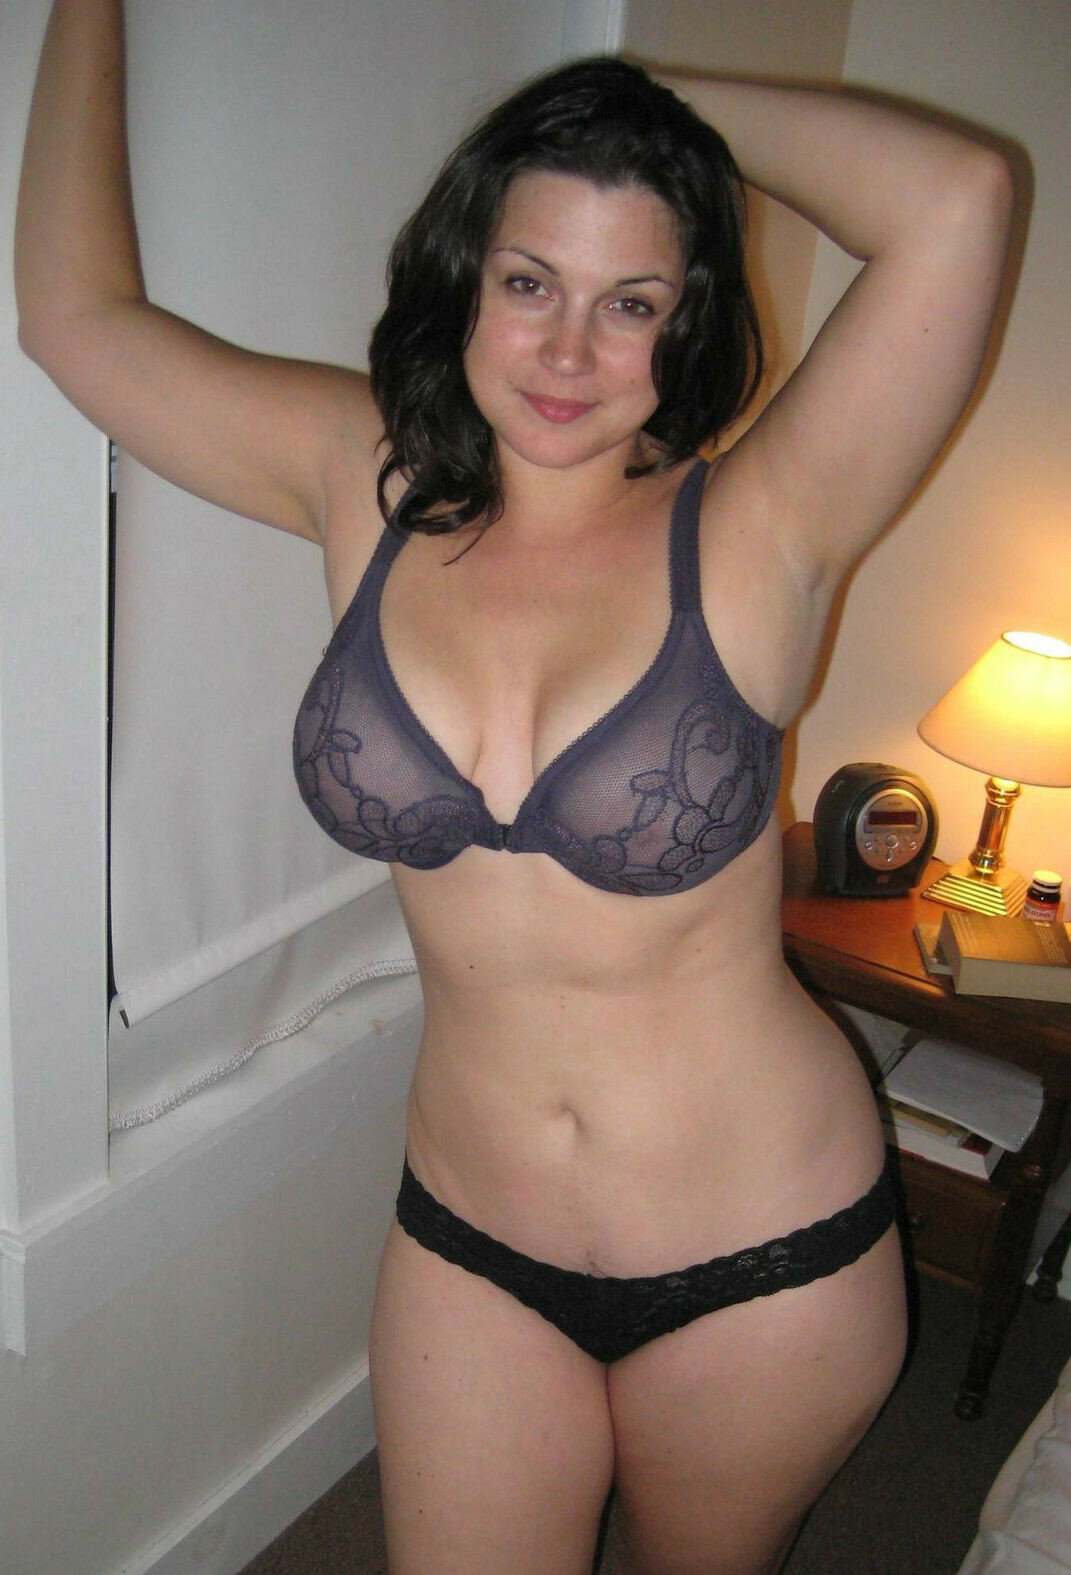 Own tit amateur mom bra torres nude